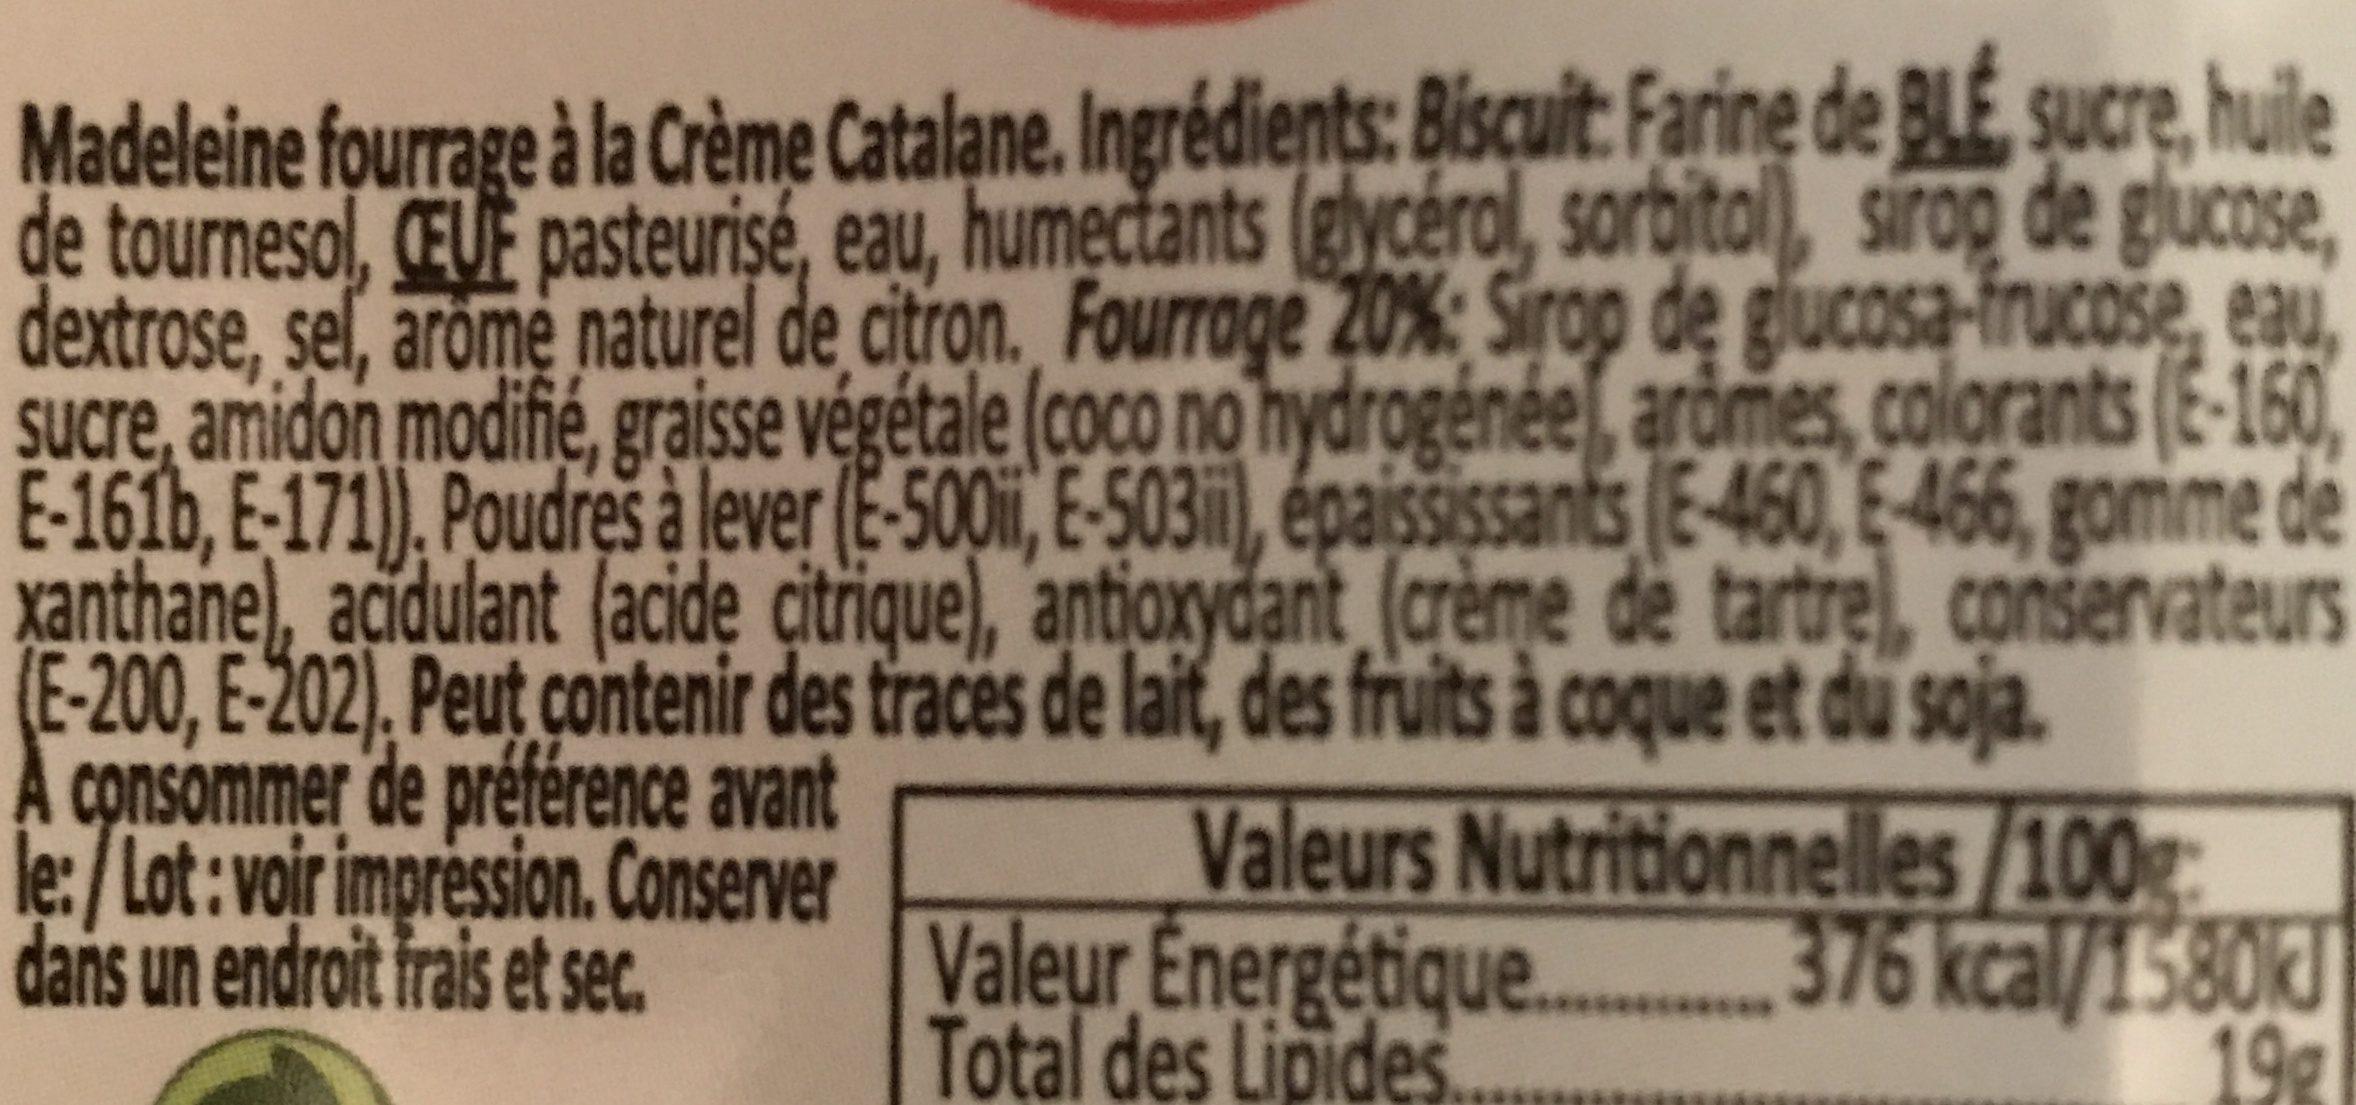 Delicias à la Crème Catalane - Ingredients